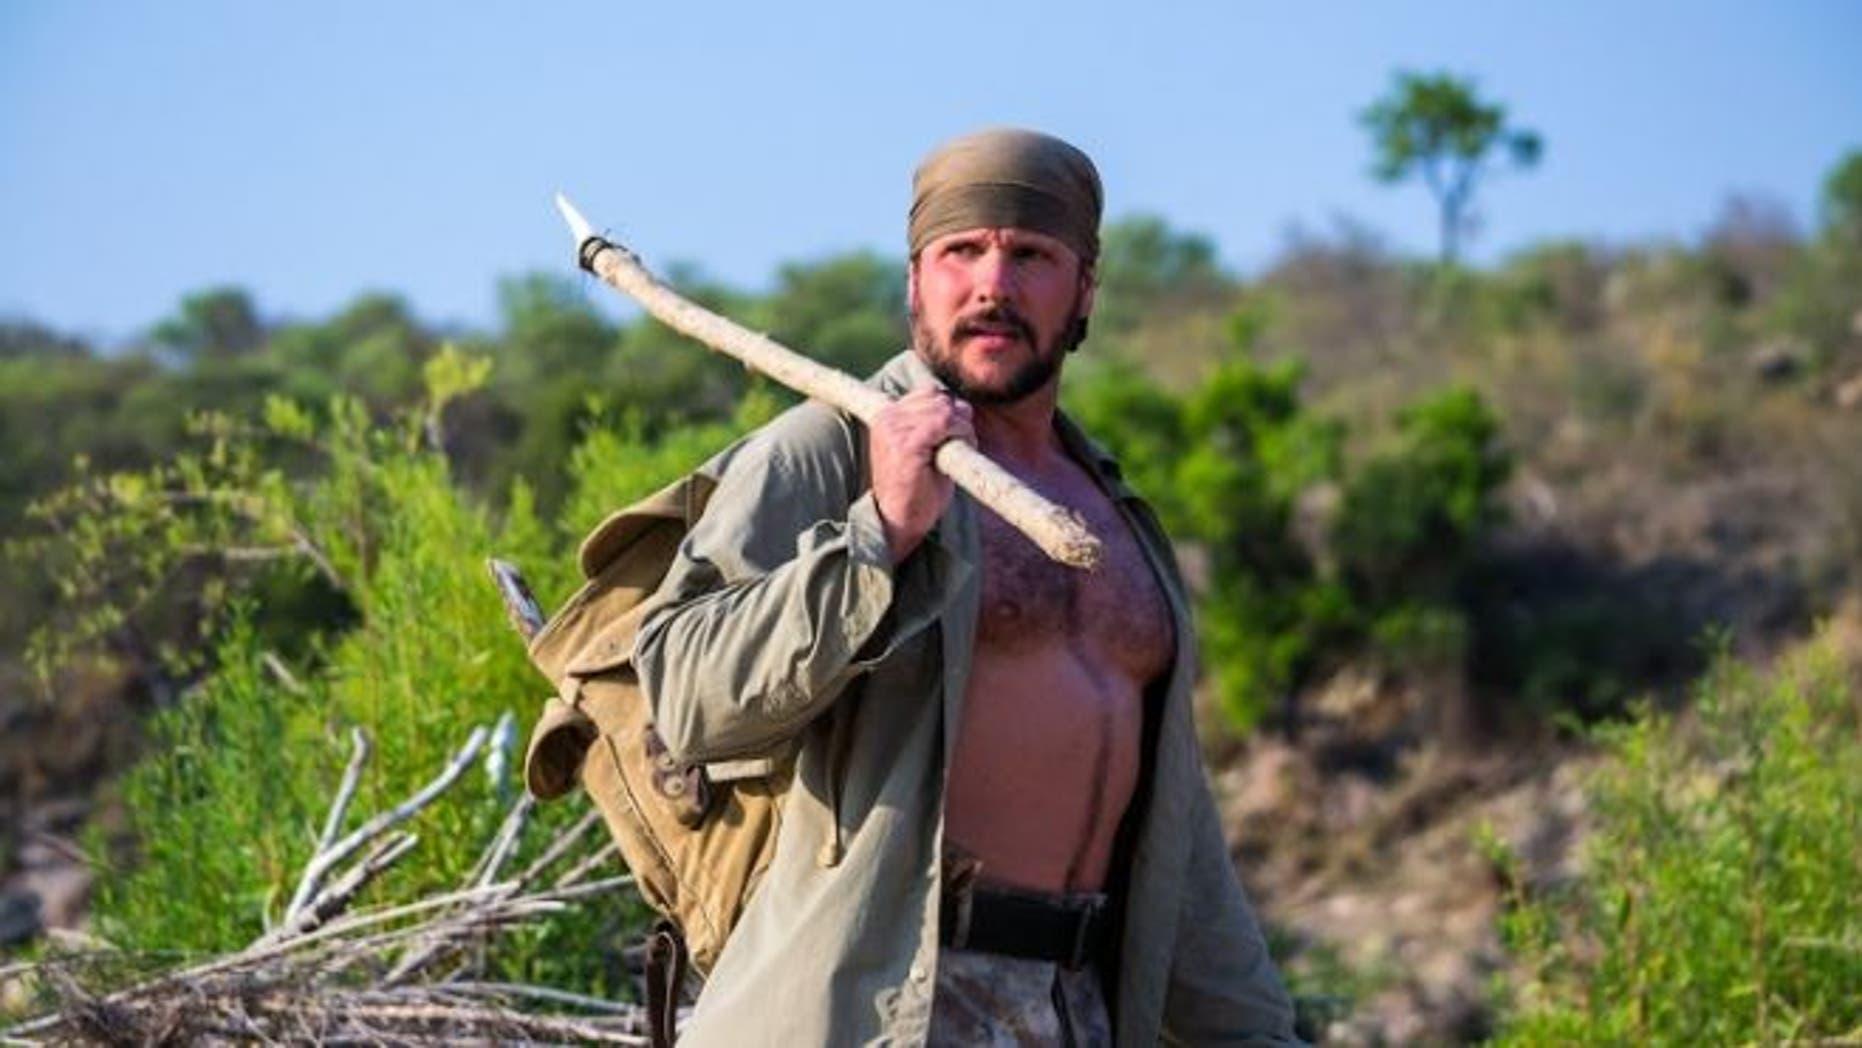 Dual Survivor' star Joseph Teti denies he lied about